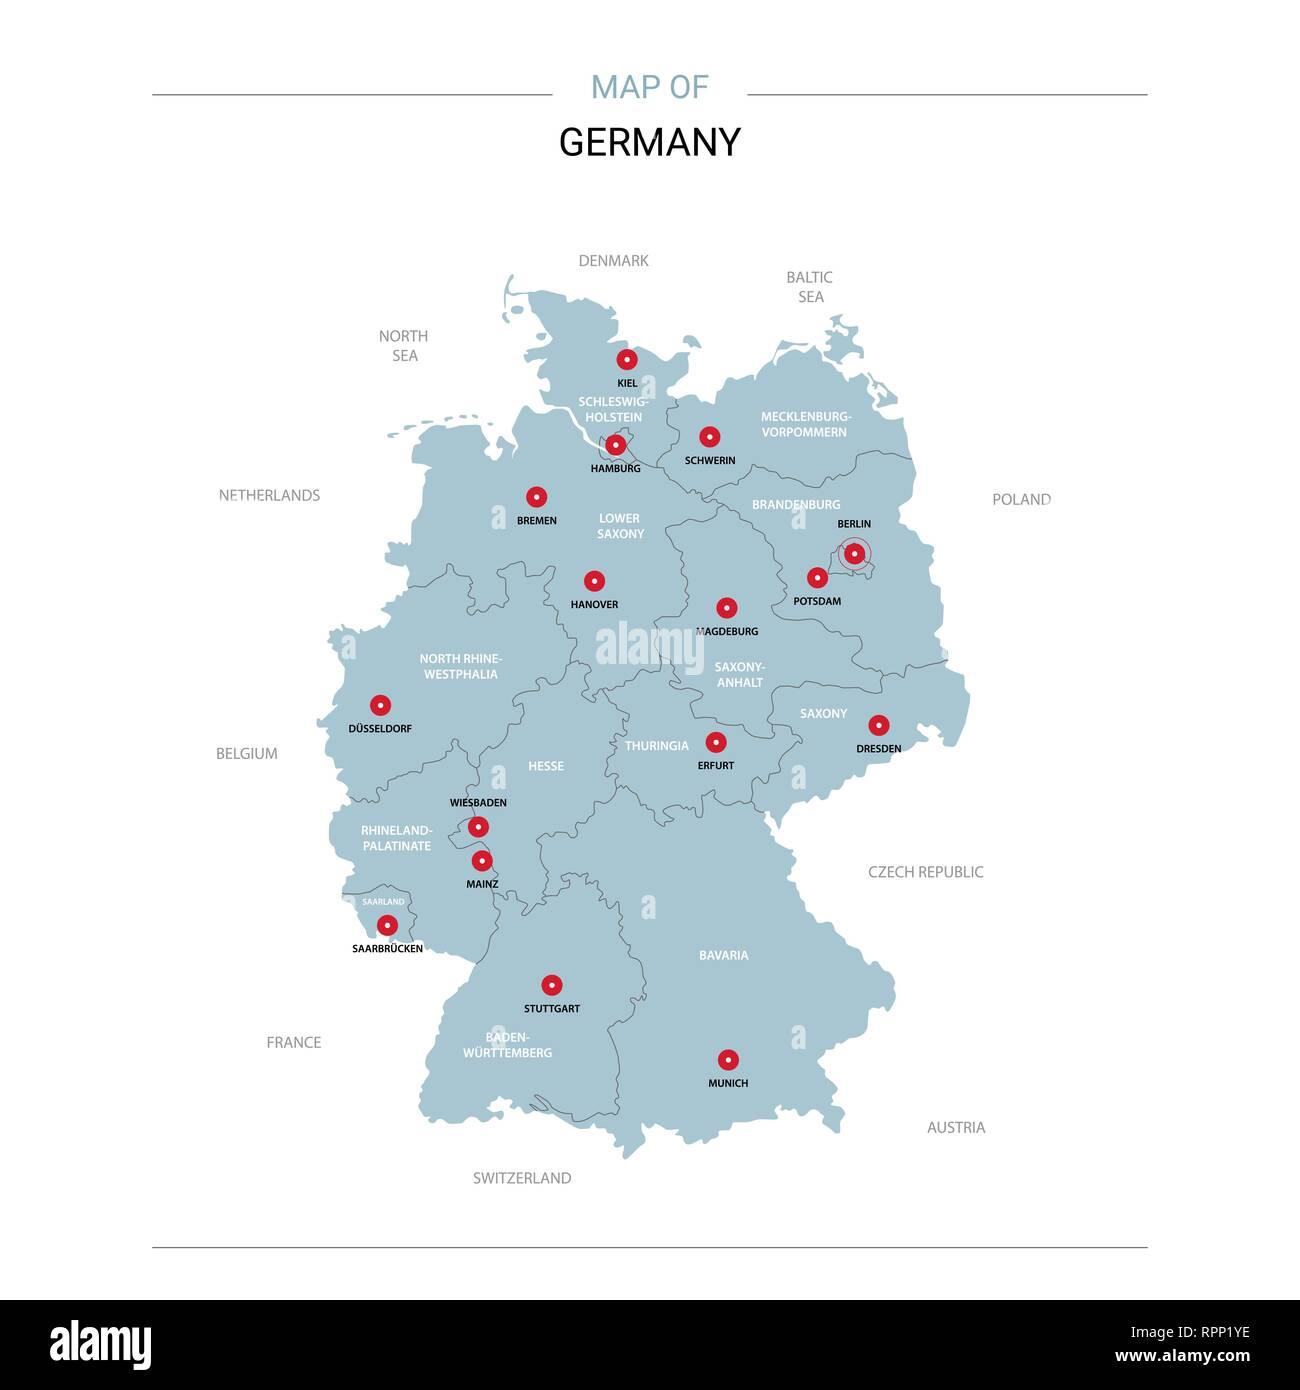 Germany Map City Pins Stock Photos Germany Map City Pins Stock